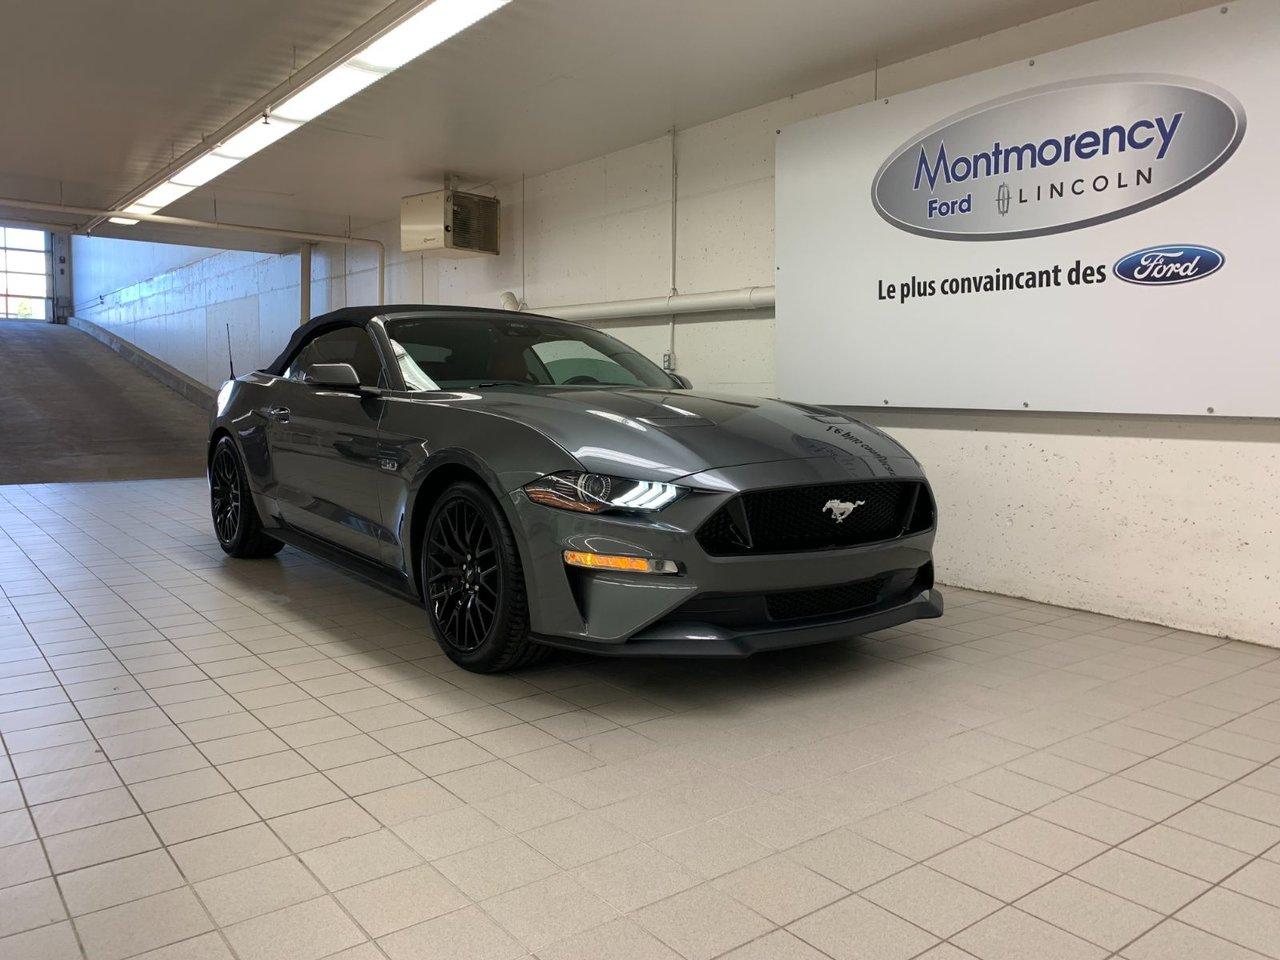 Ford Mustang 2021 GT Premium CONVERTIBLE - ENS. PERFORMANCE, GP